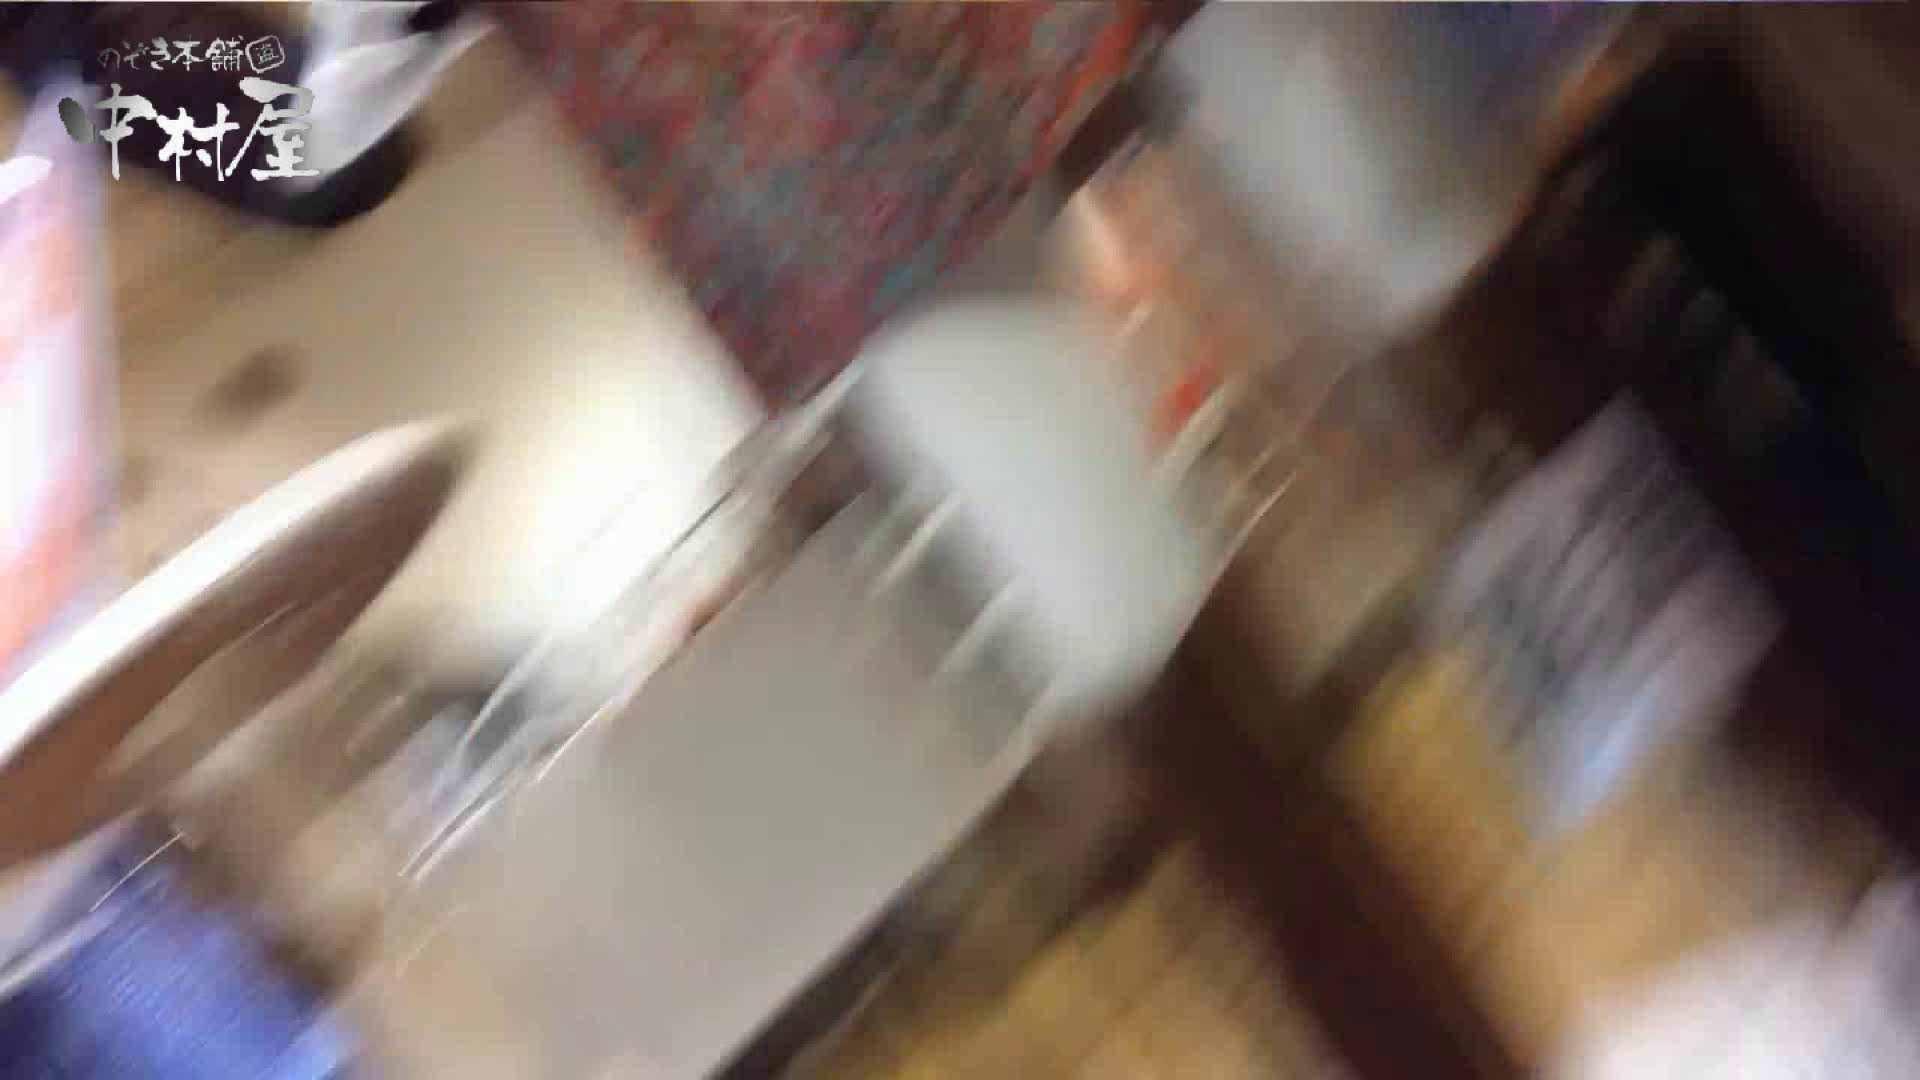 vol.43 可愛いカリスマ店員限定‼胸チラ&パンチラ 美脚おねーさんの胸元ゲット! 接写 | 胸チラ  76PIX 33